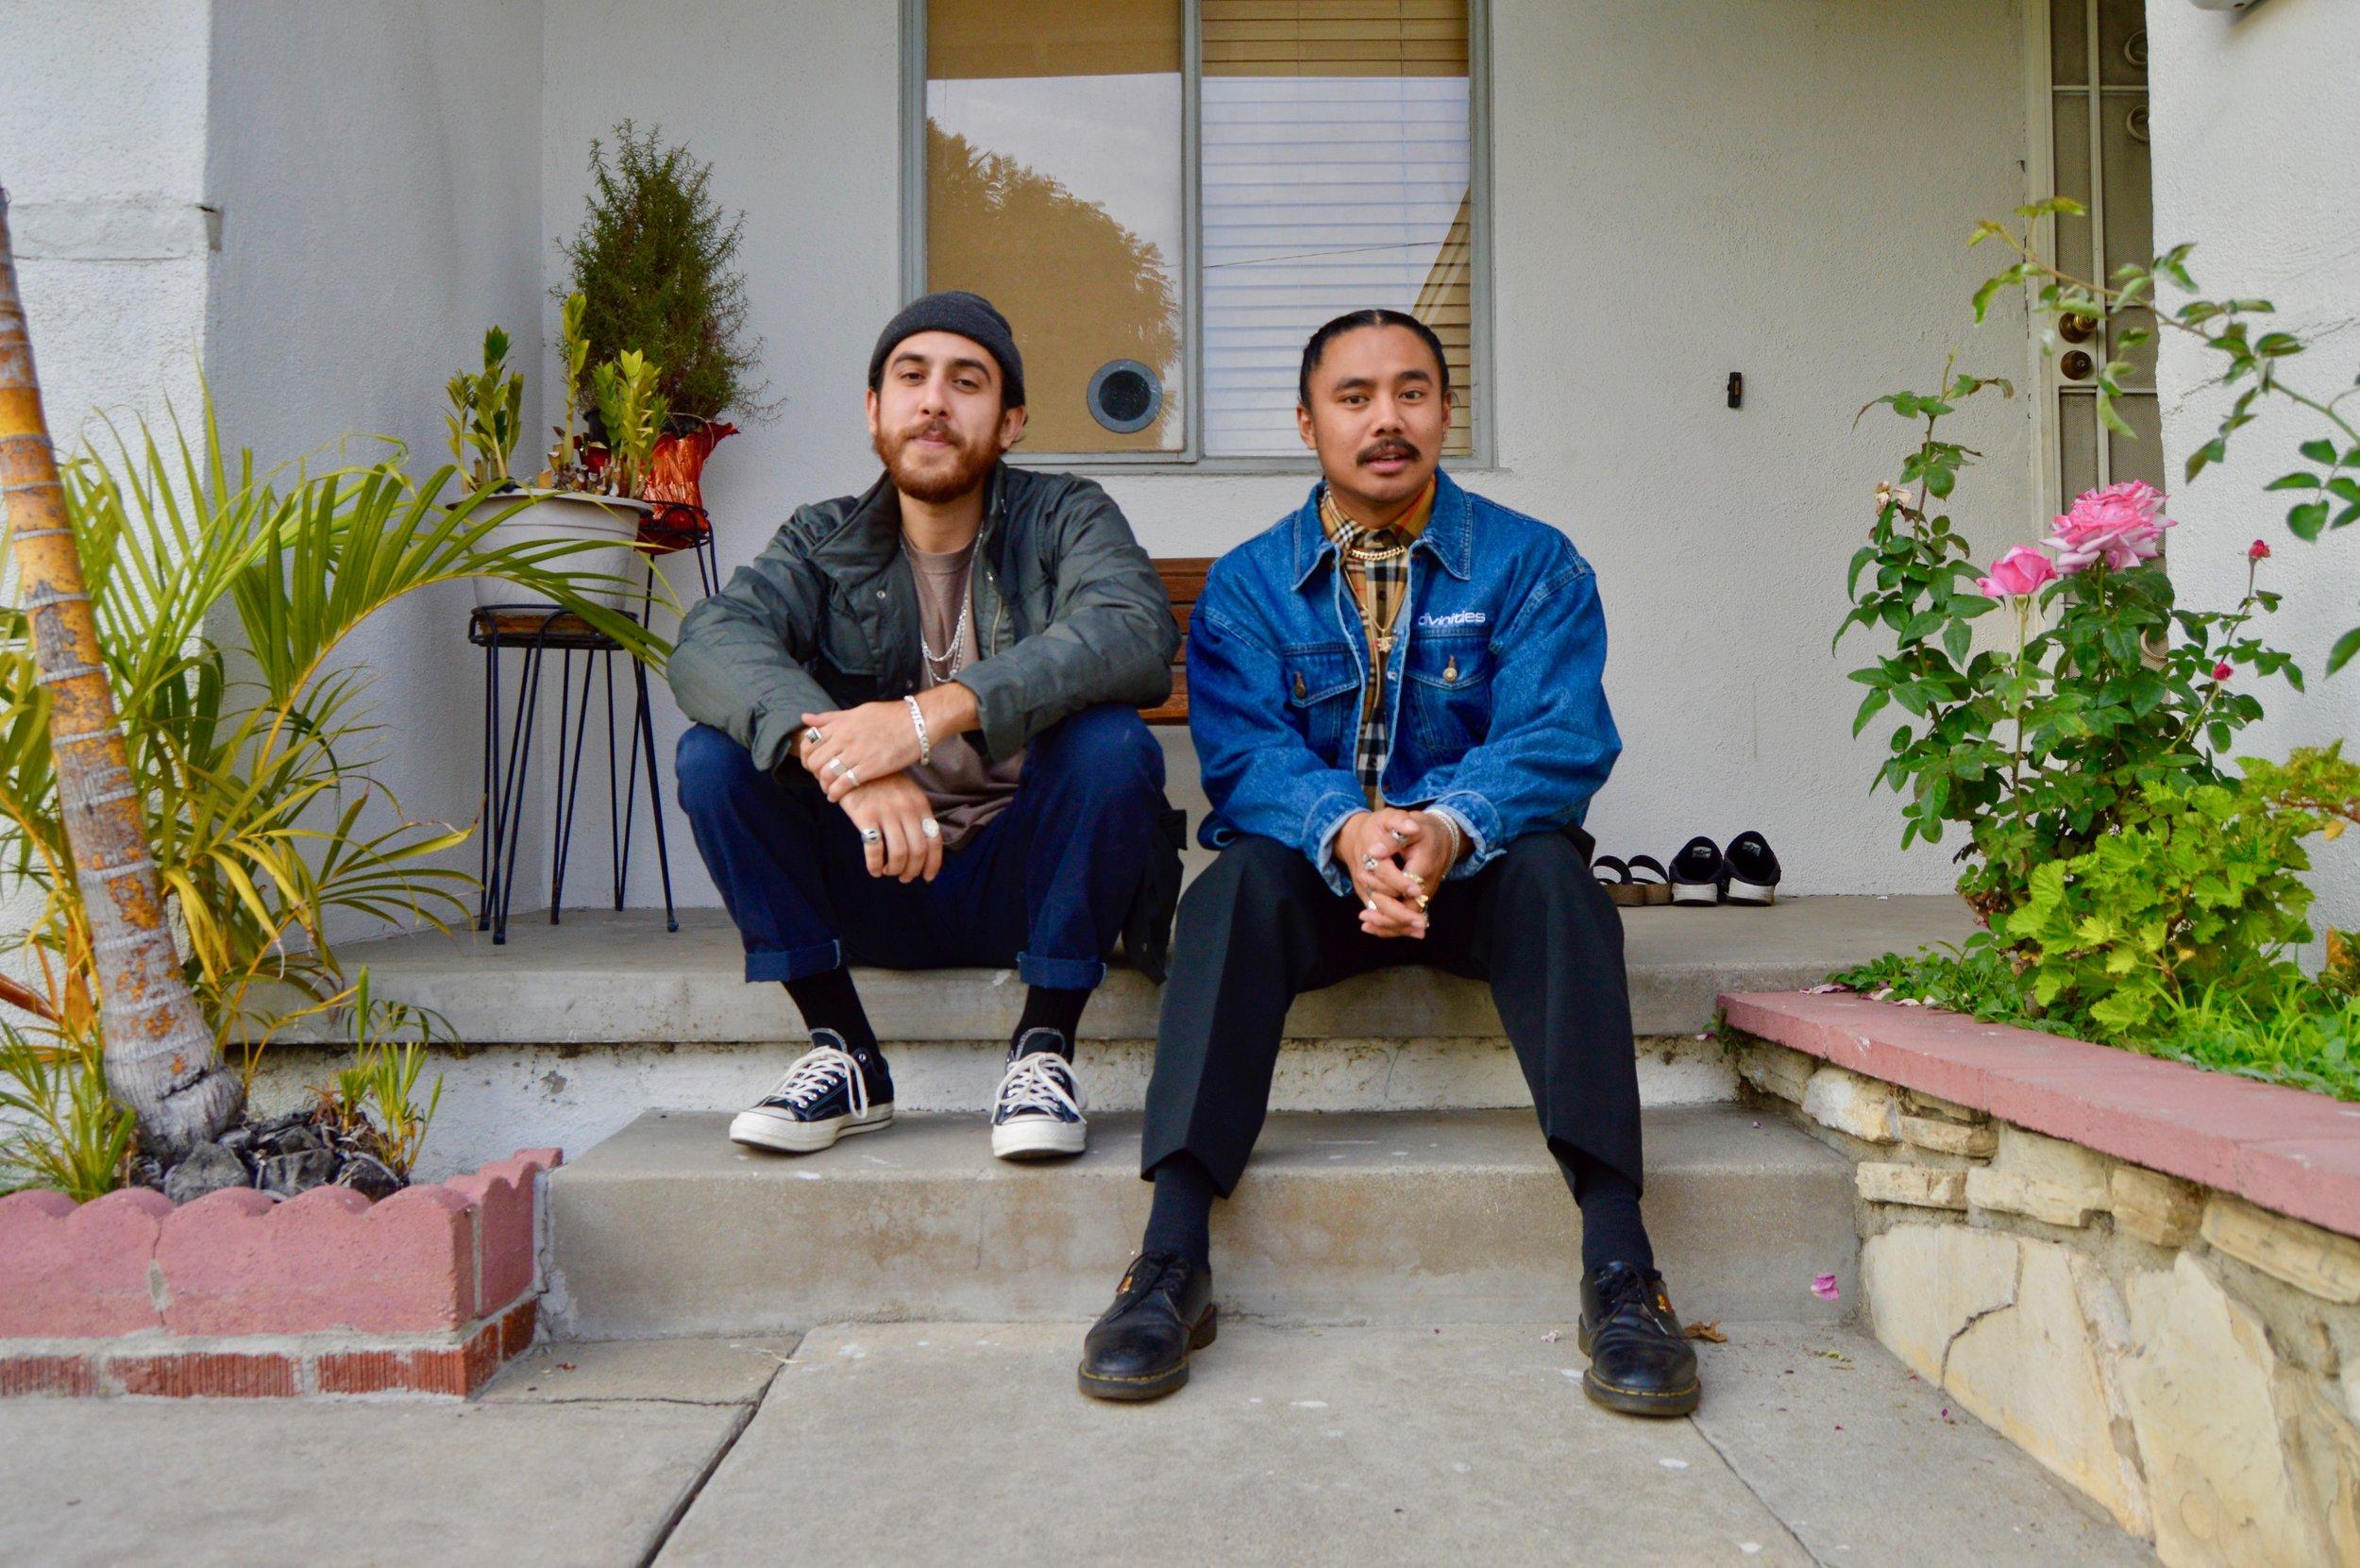 Abraham Recio and Ryan Santos. Photo by Alexis Nettles.